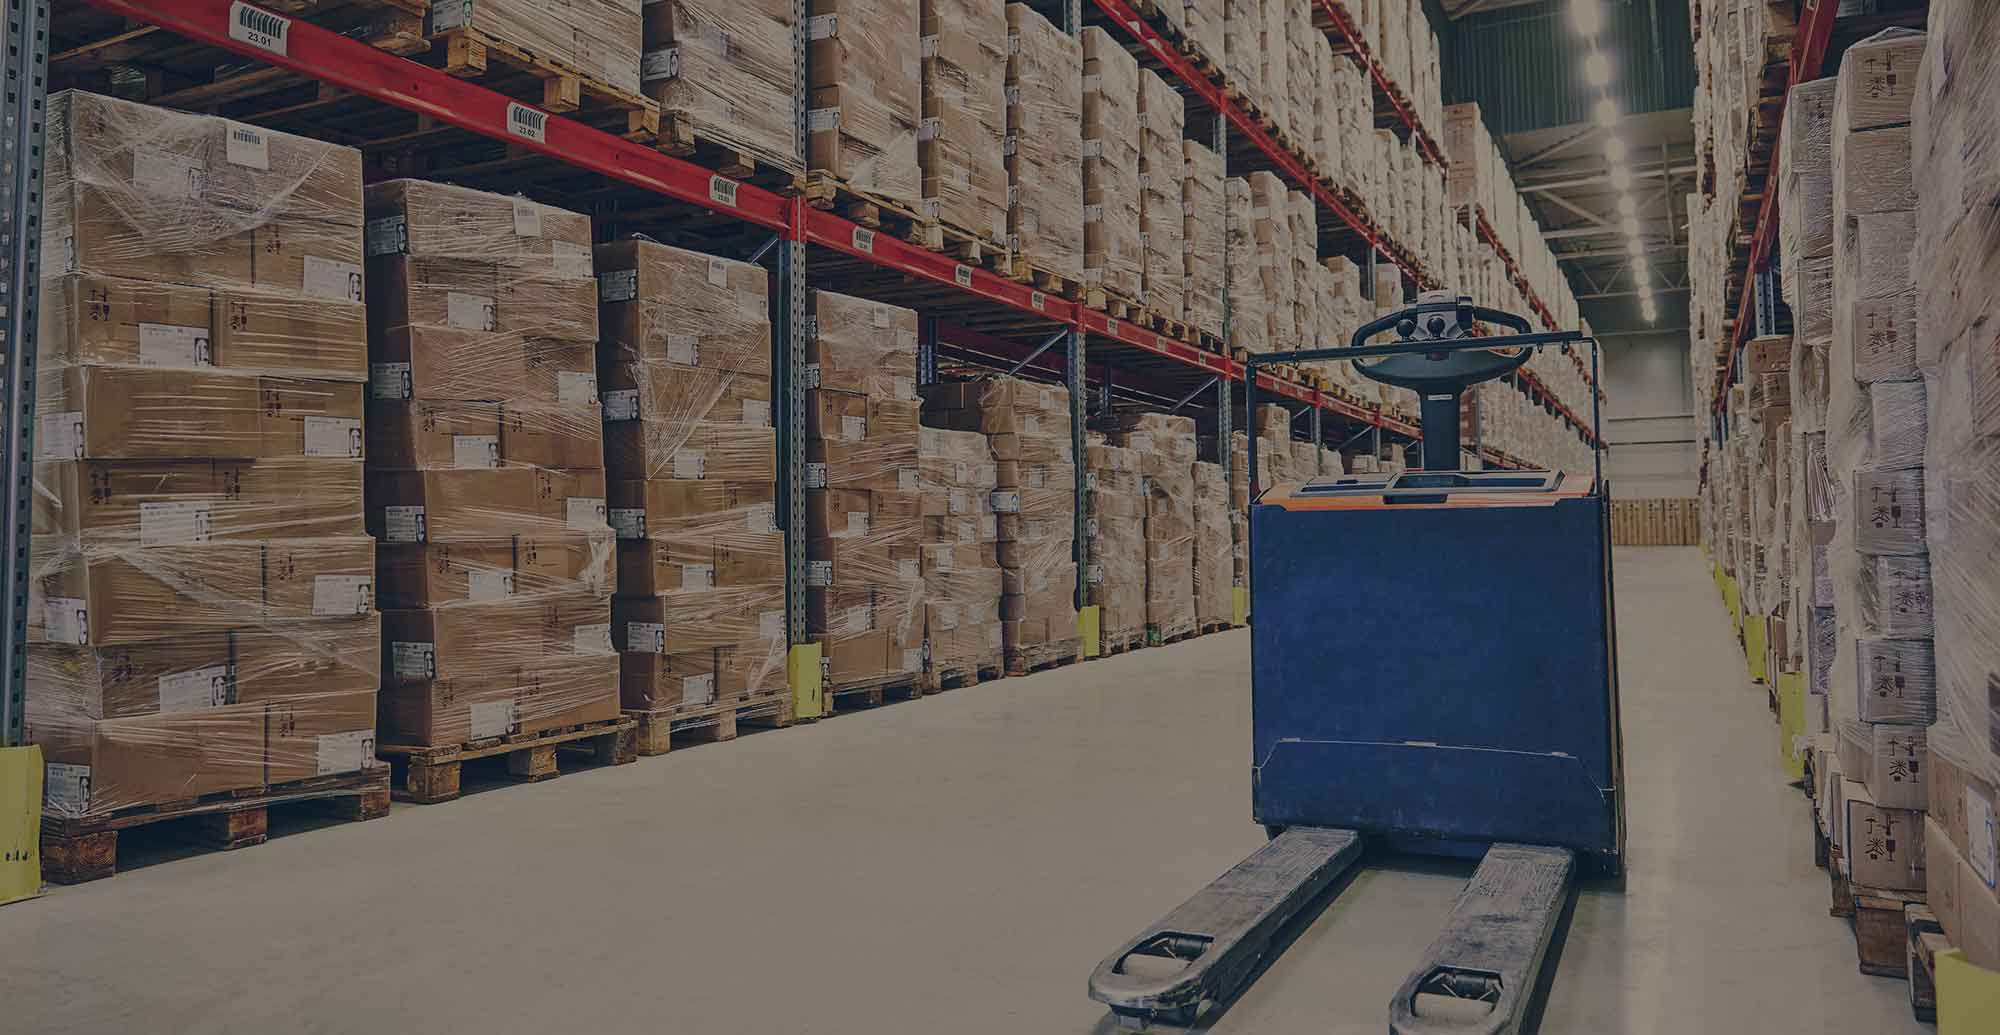 Warehouse WiFi Basics: Choosing the Right Equipment for the Job